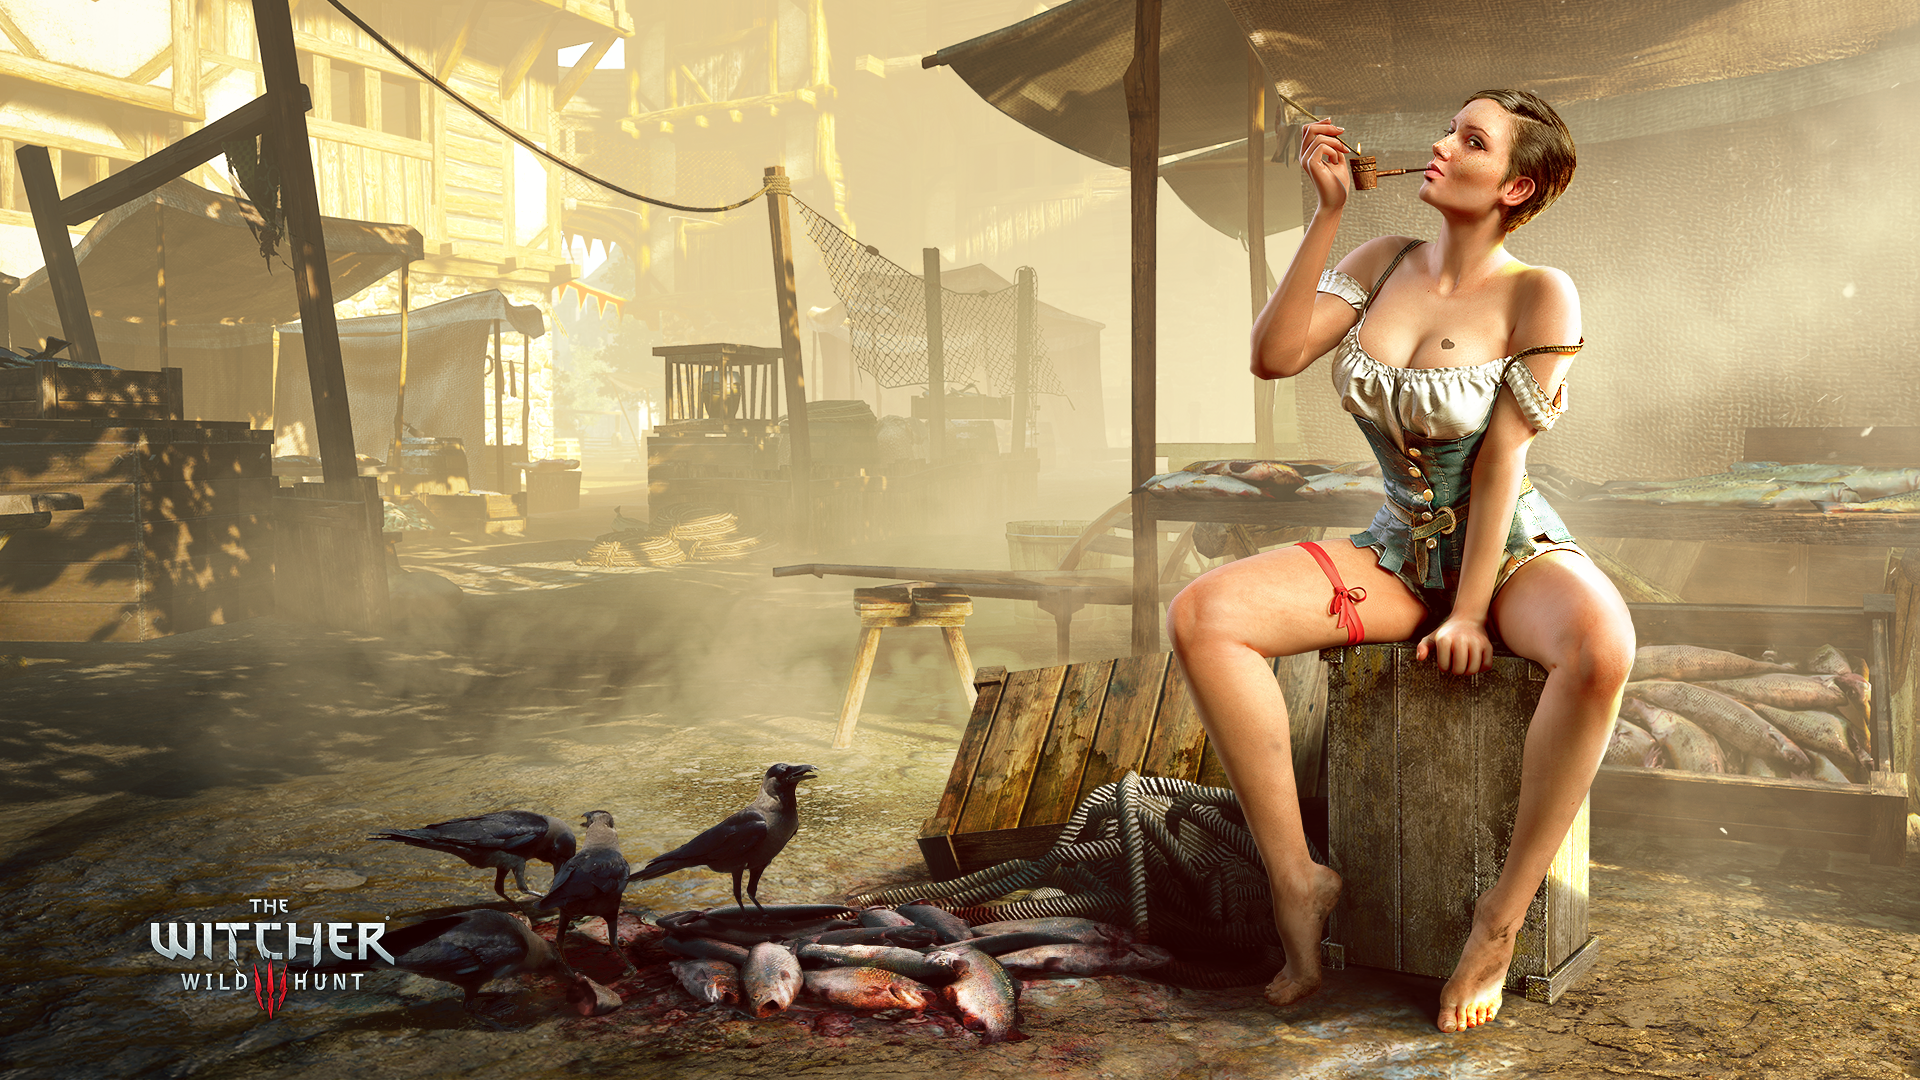 The Witcher 3 Wild Hunt Desktop Images